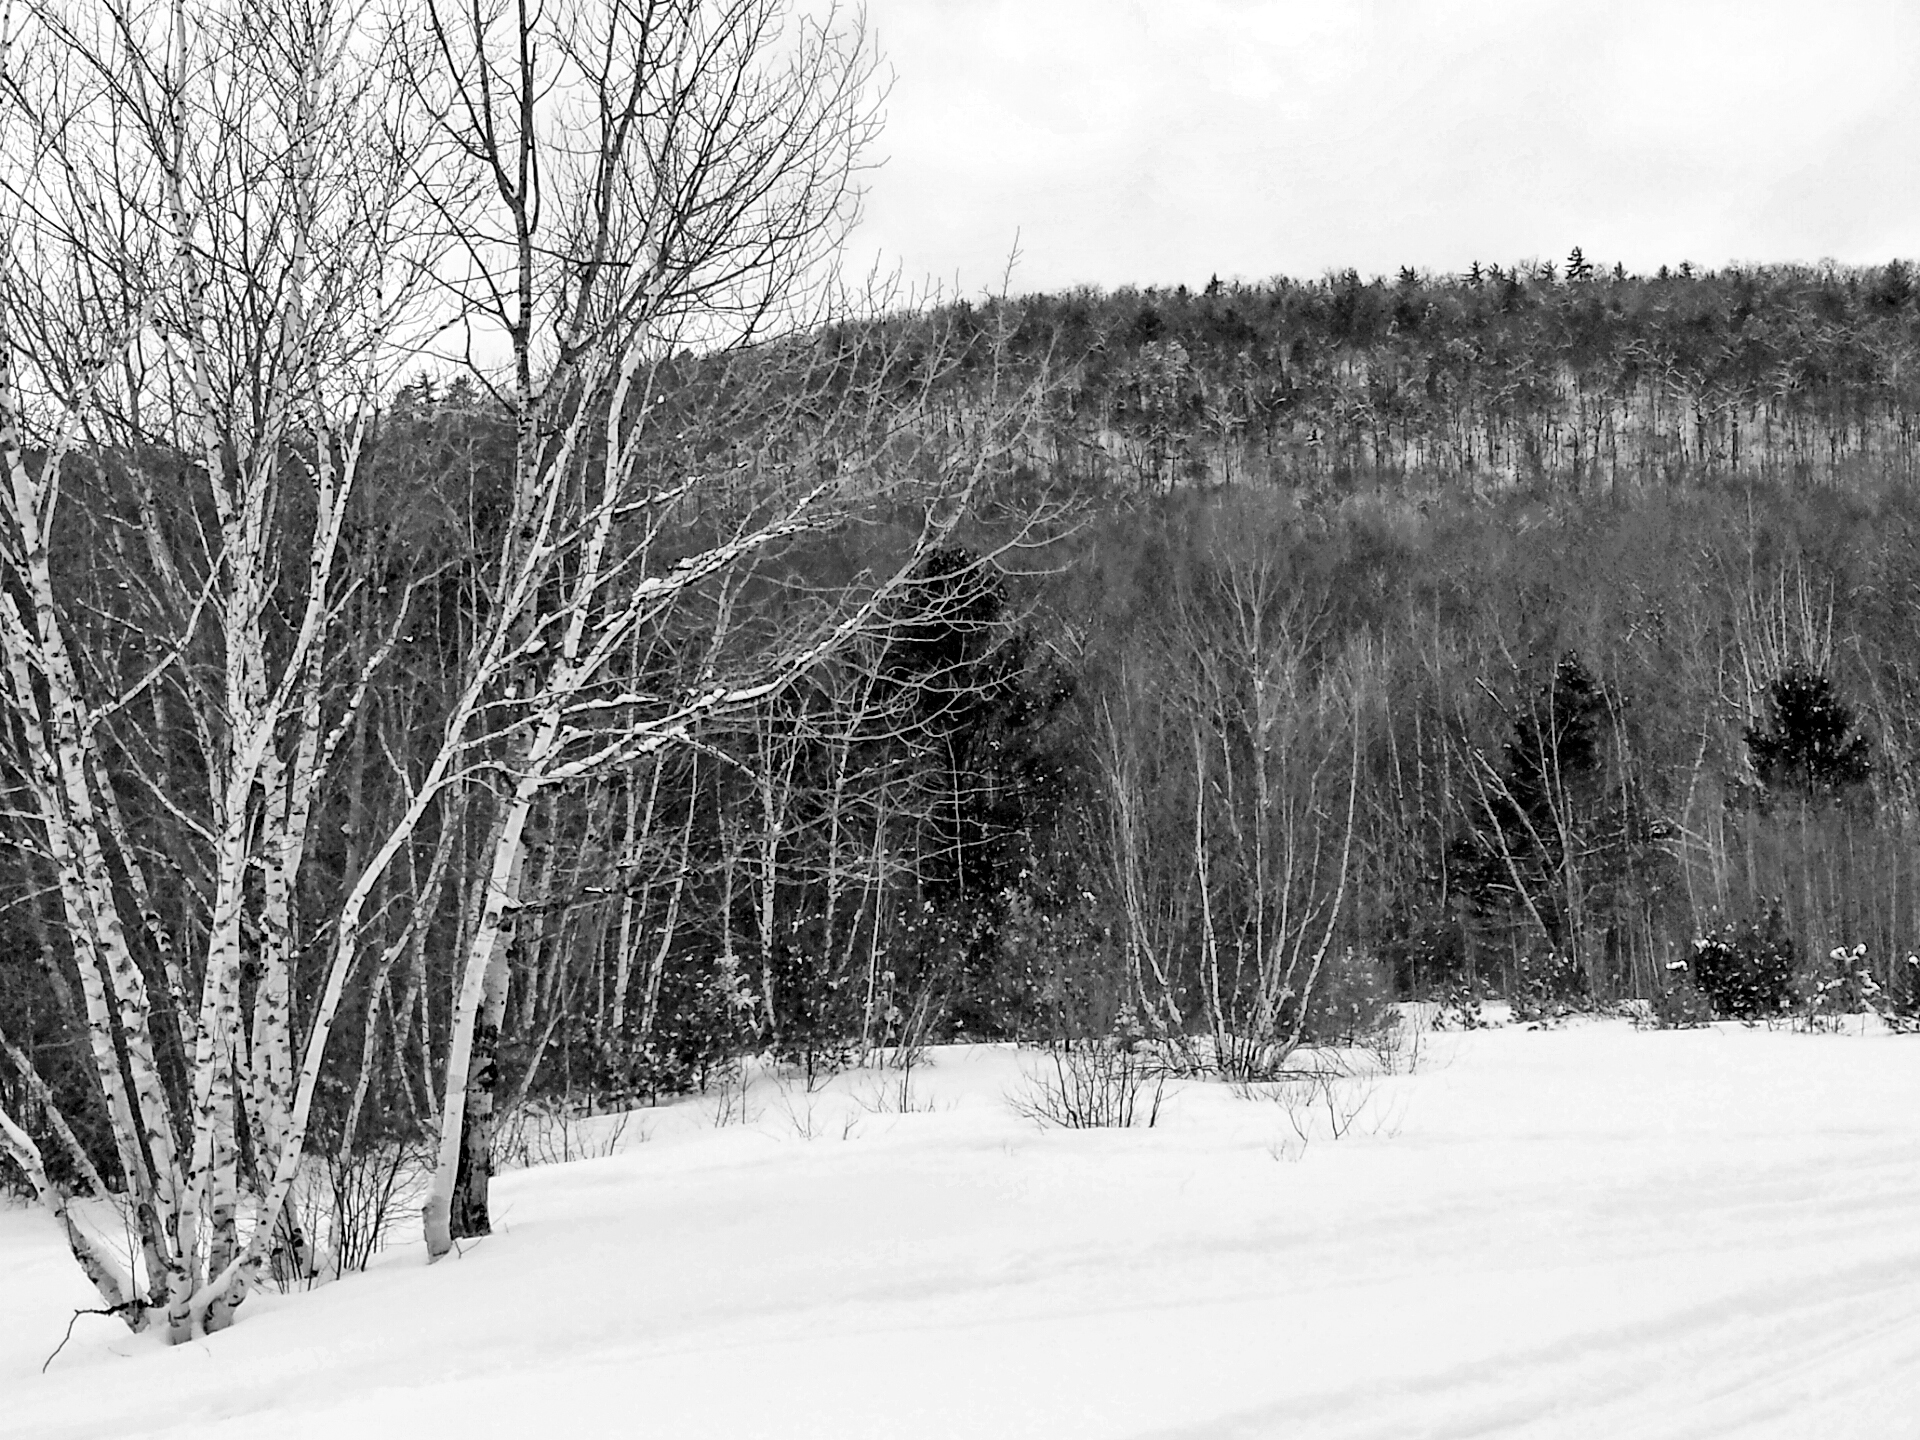 Wonderful Wallpaper Home Screen Snow - 2015-02-22-15-19-00  HD_628633.jpg